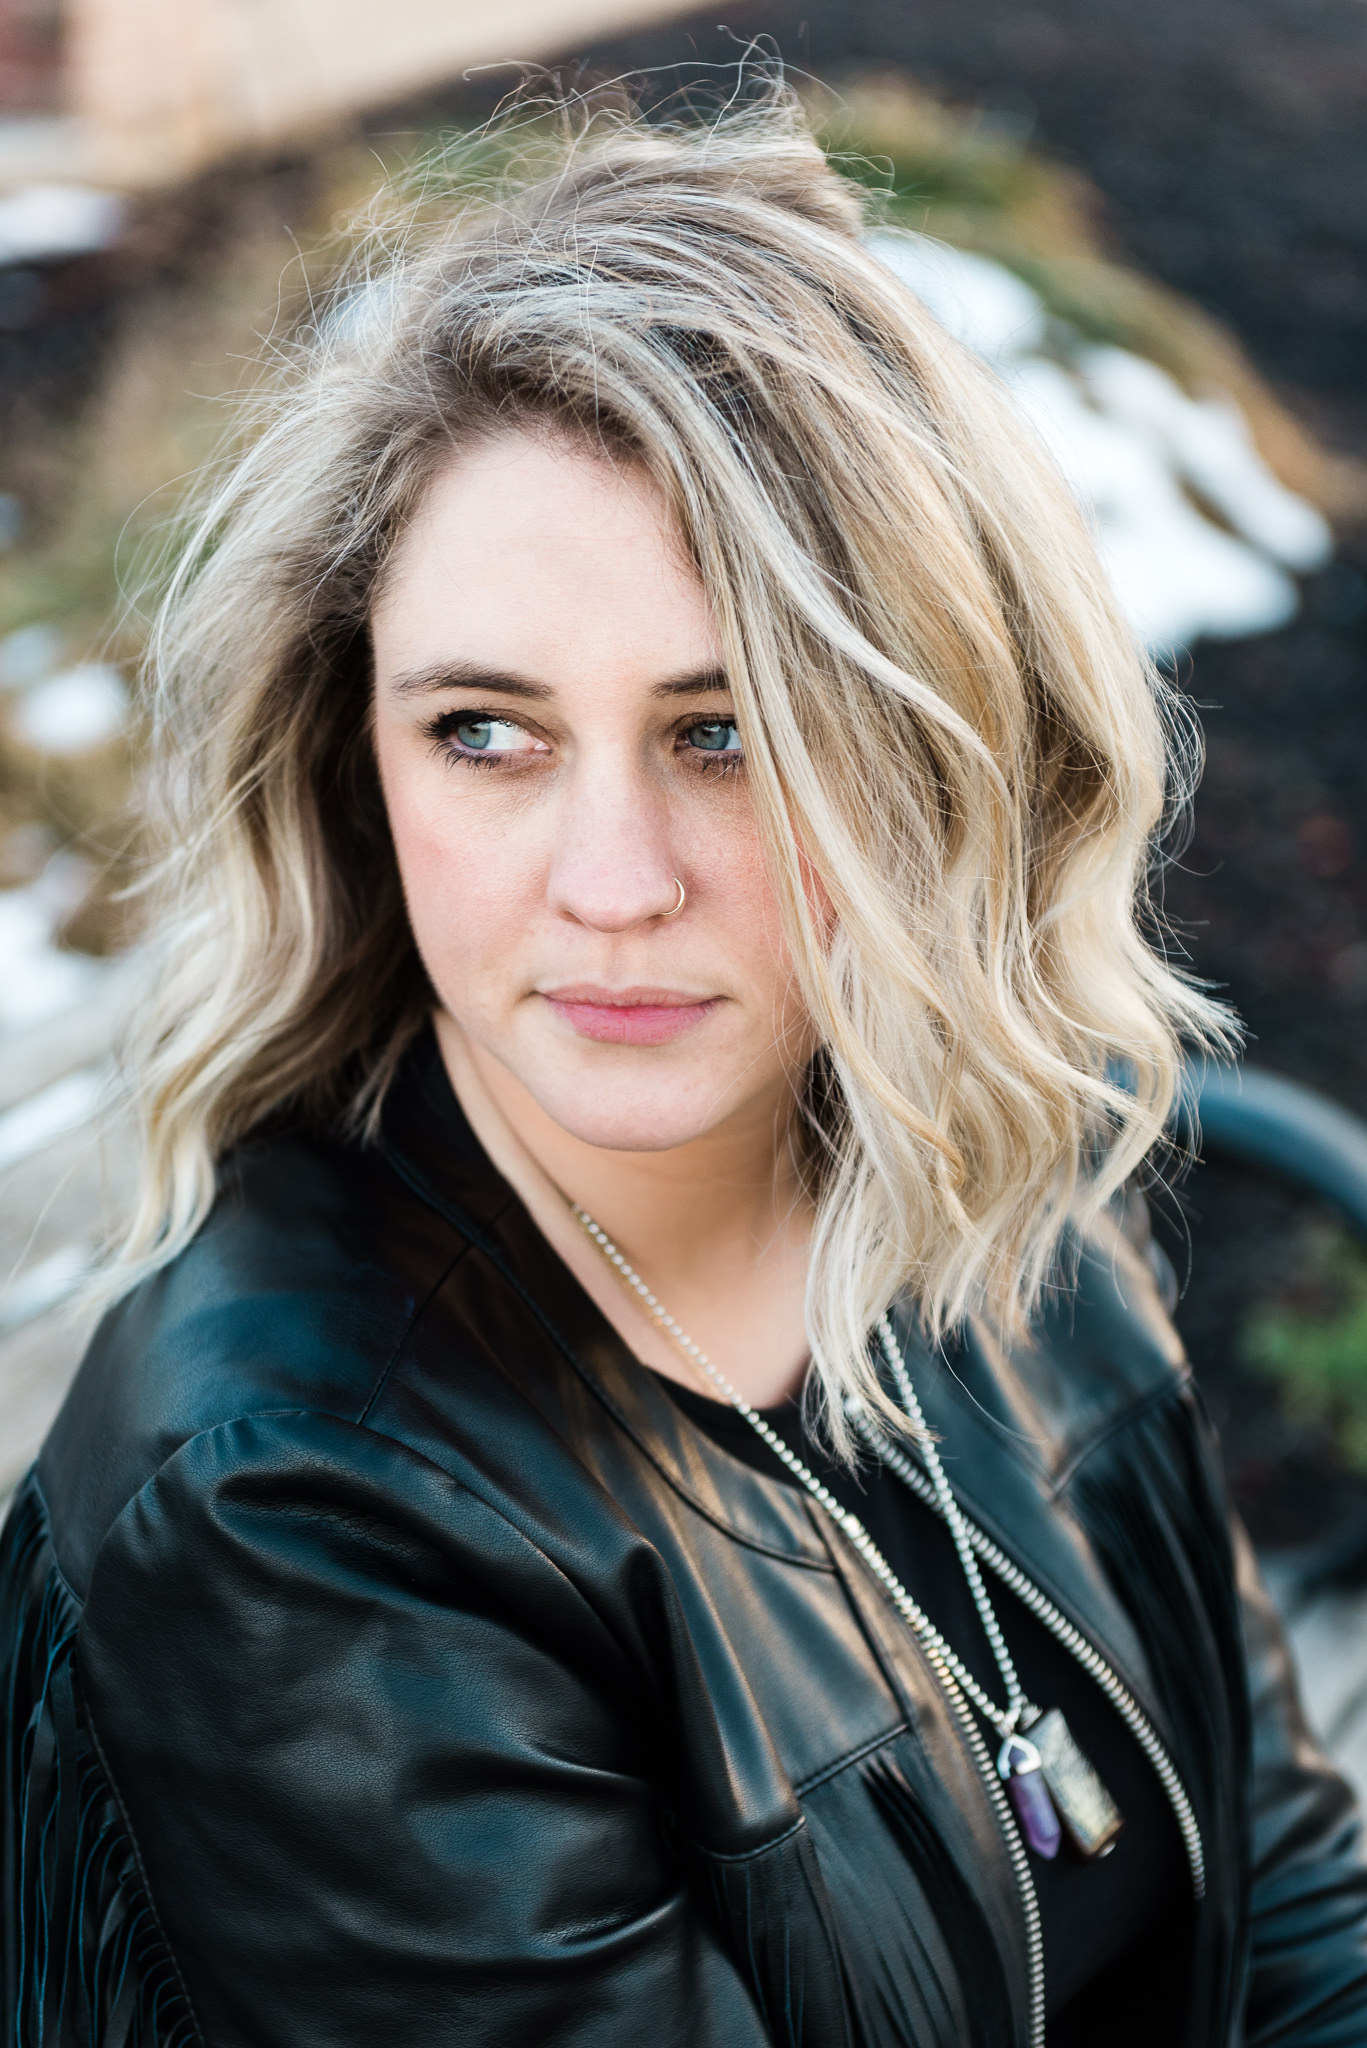 Caisy Lynn Falzone Stars and Scars Photo